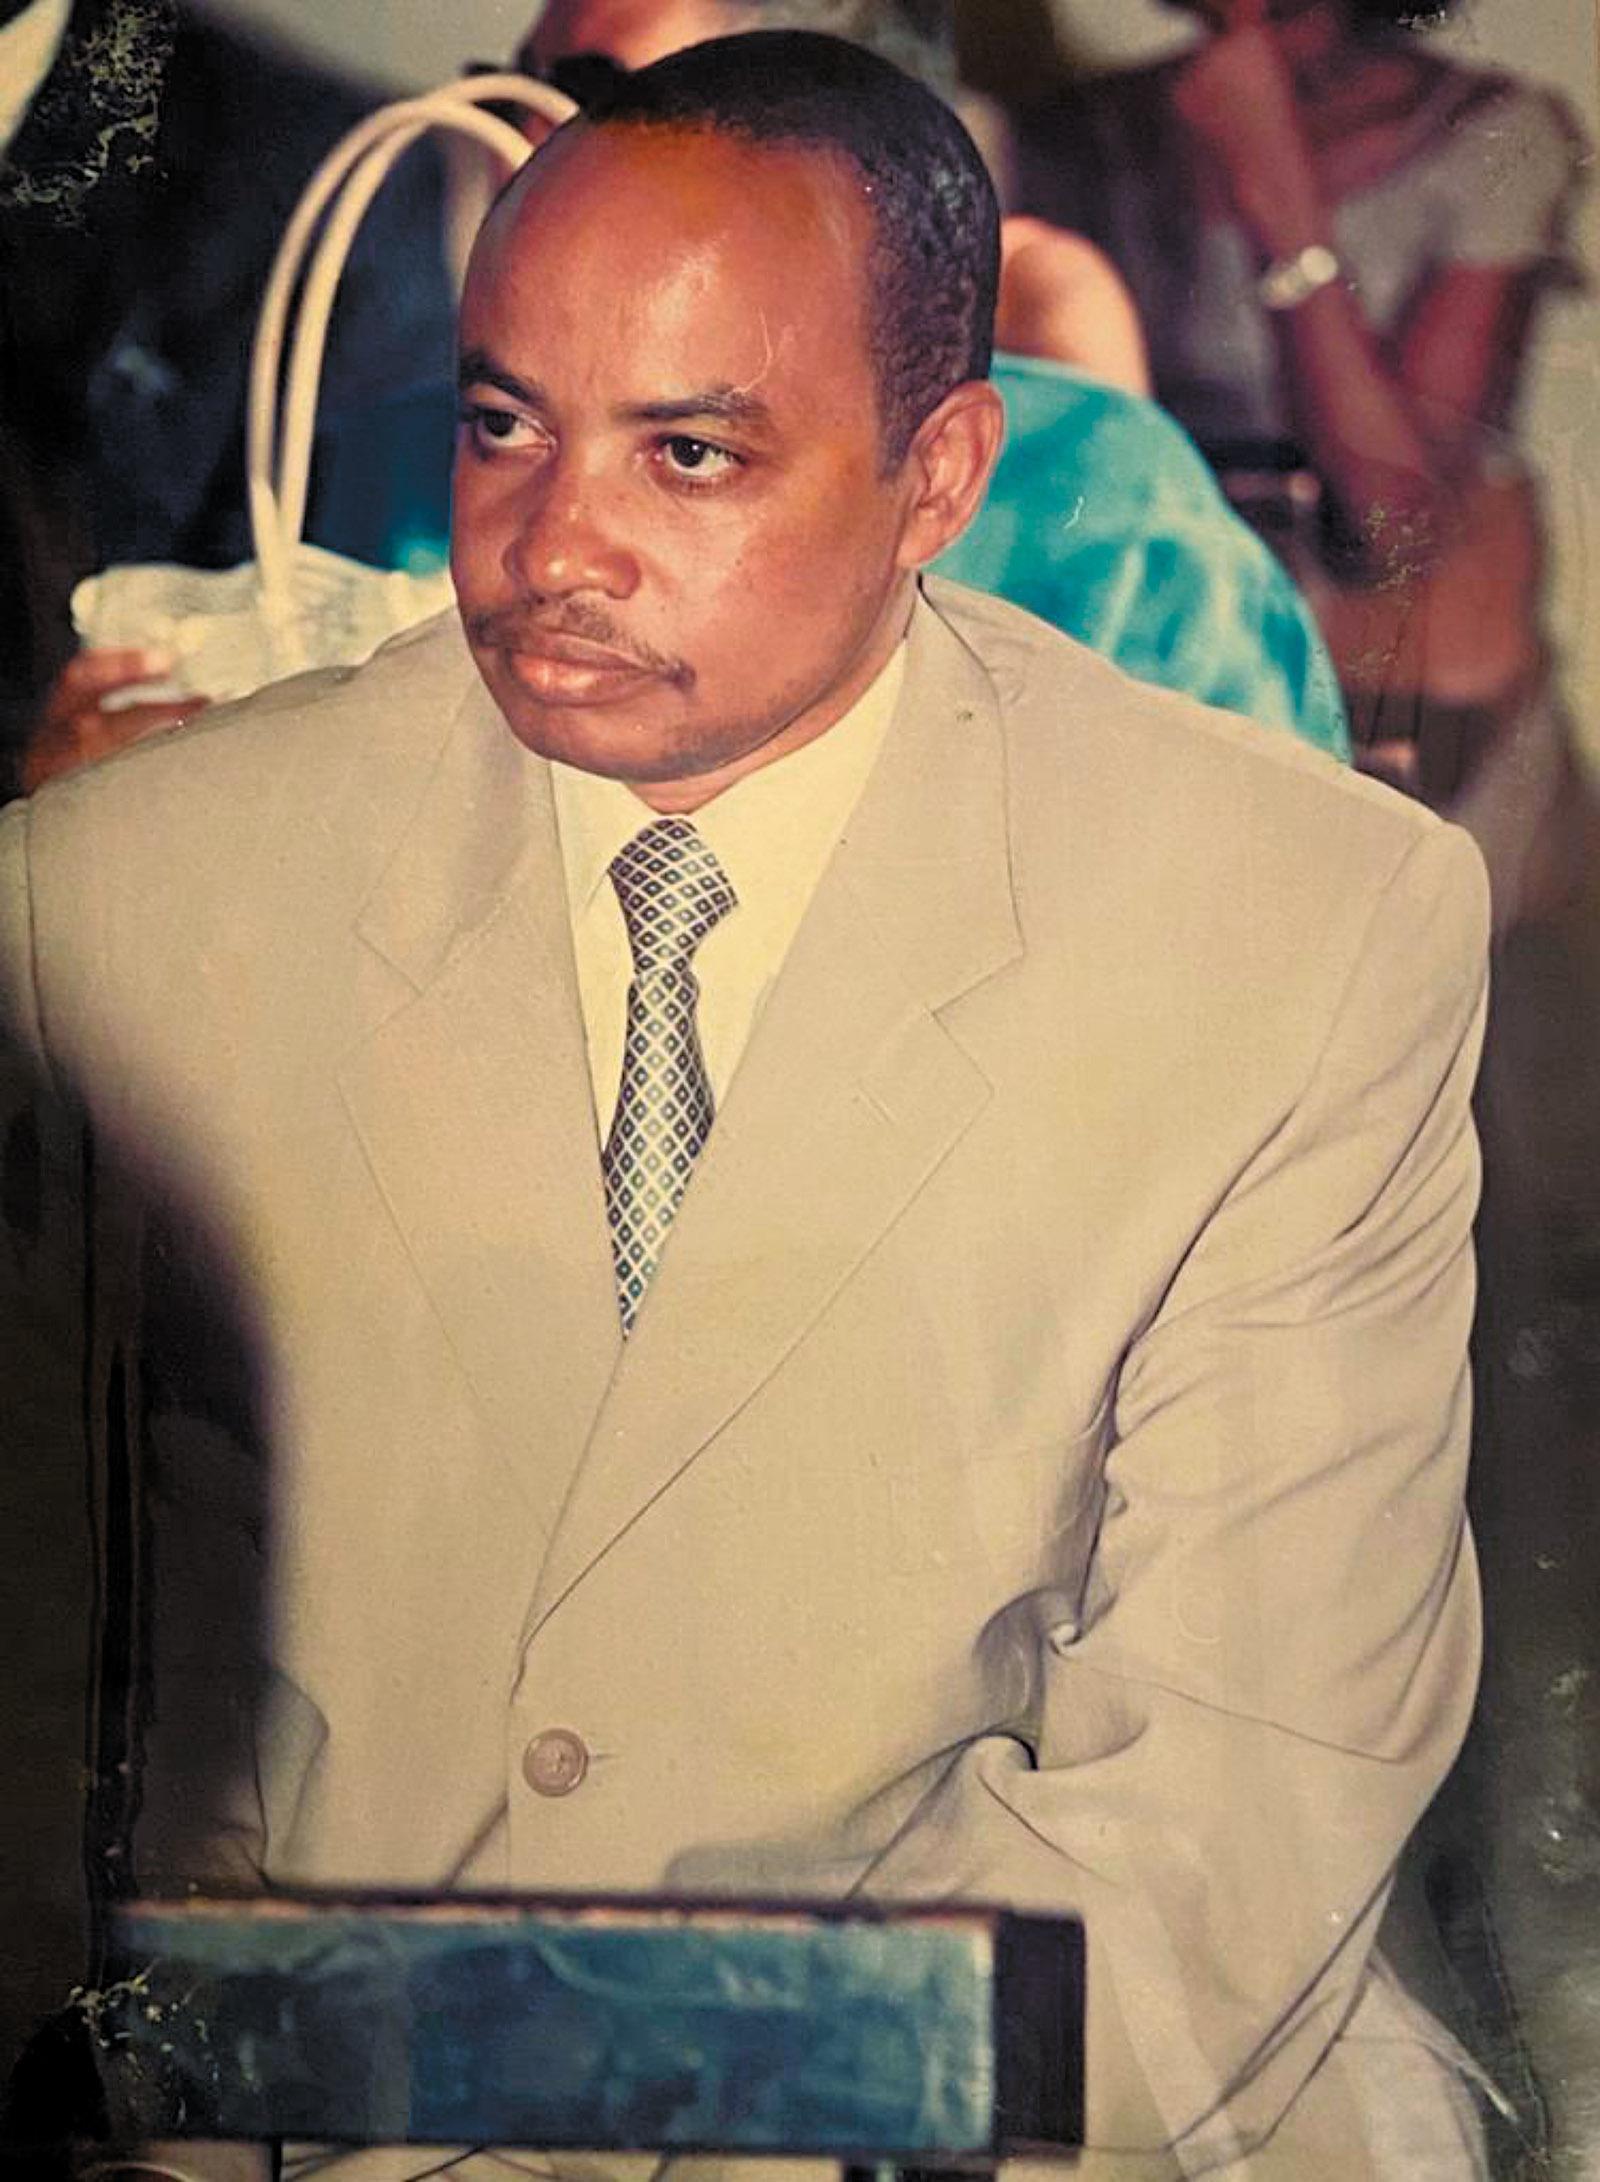 Rwandan intelligence chief Patrick Karegeya